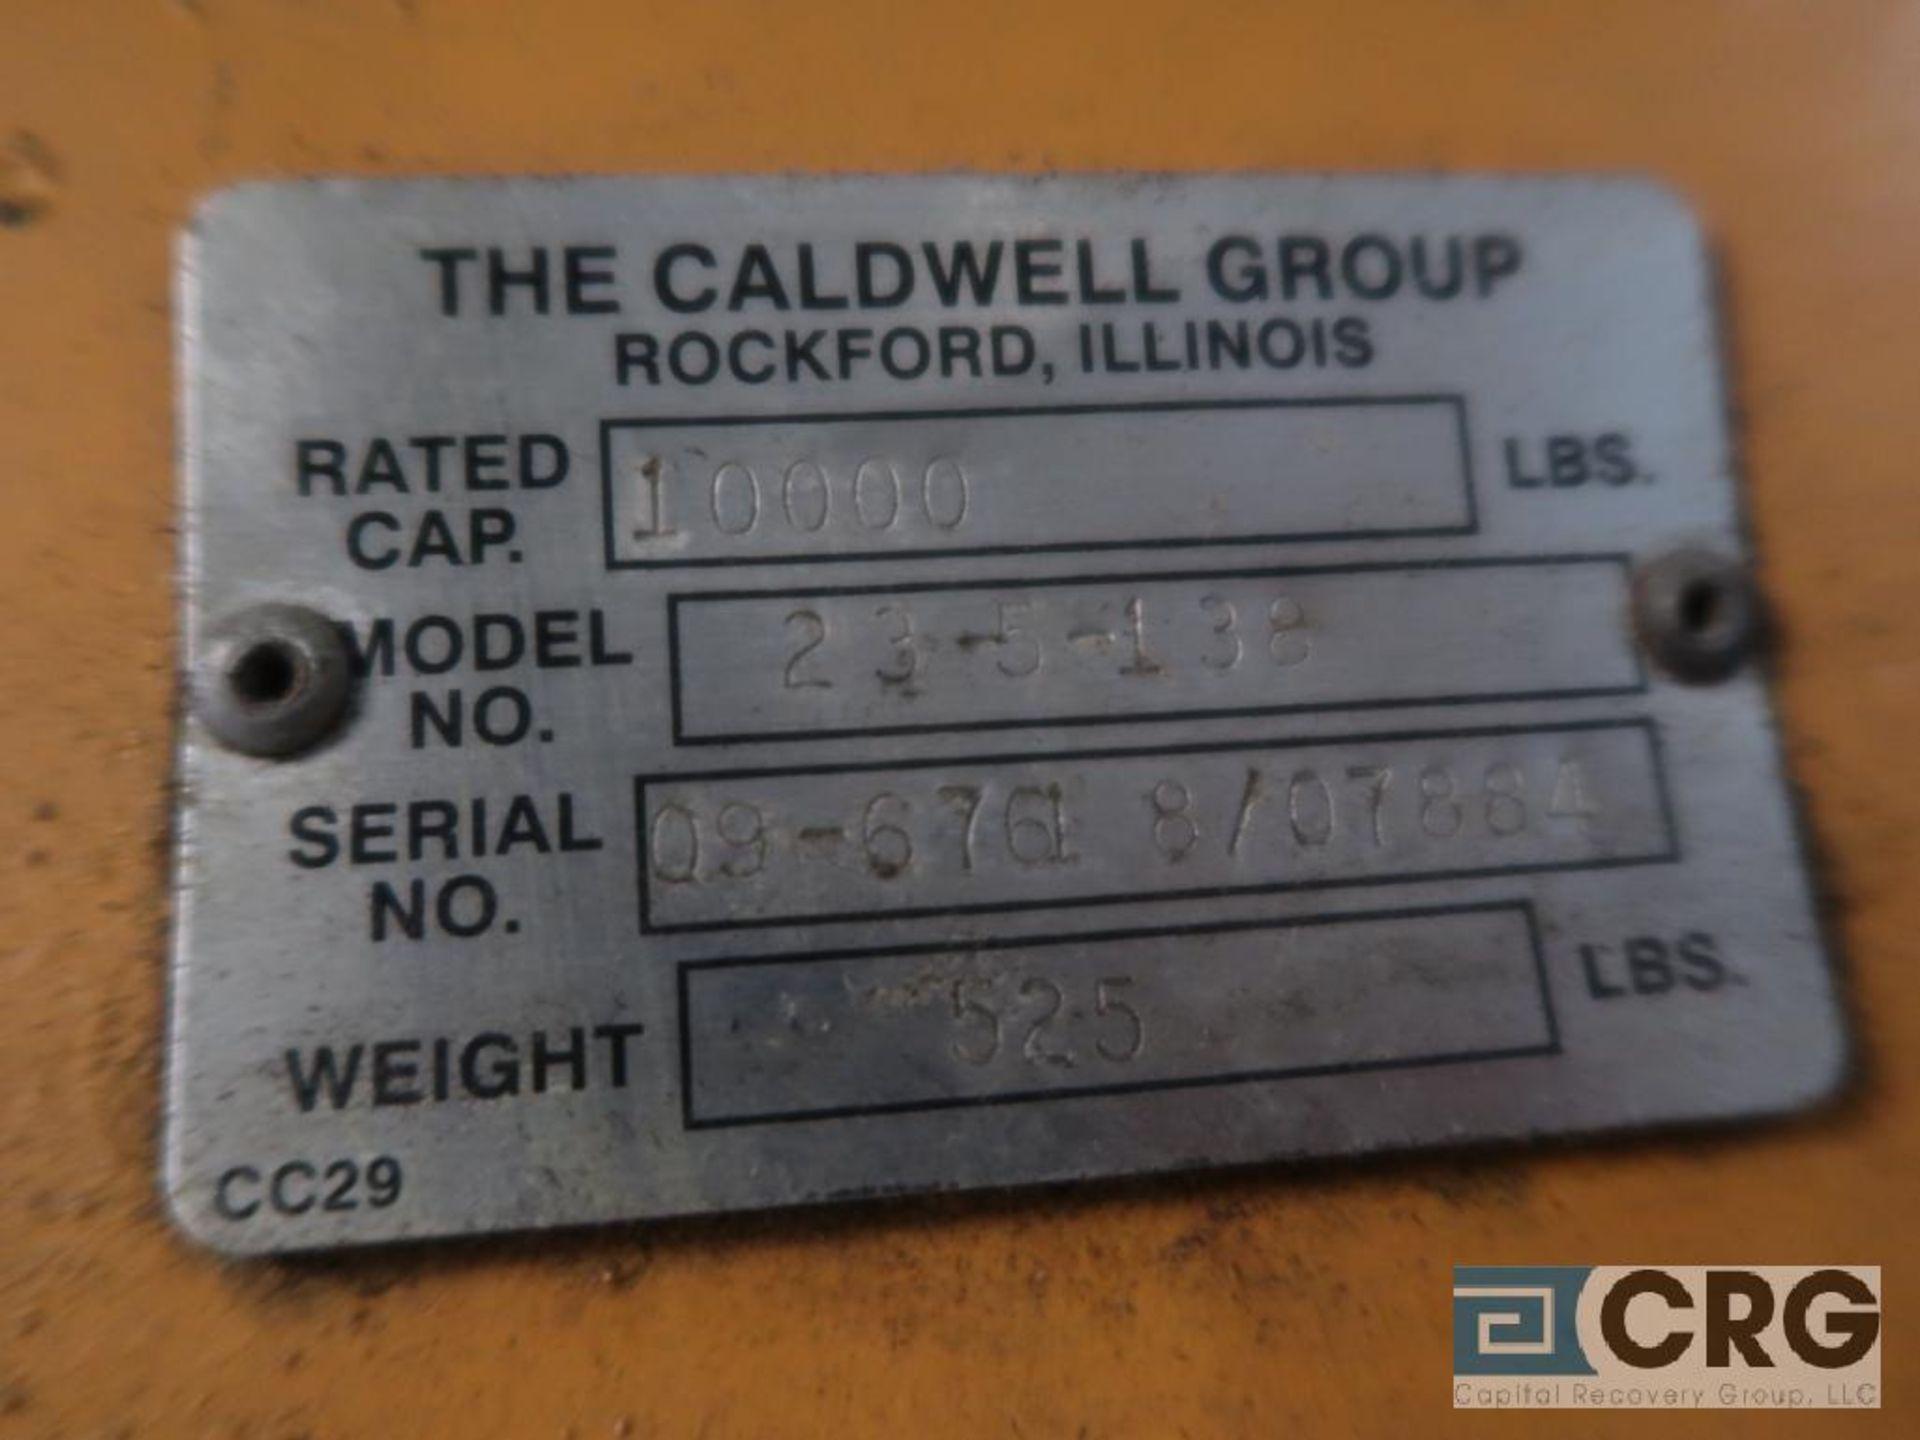 "Caldwell spreader bar, 5 Ton capacity, 11' 11"" span (PM1 Area) - Image 2 of 2"